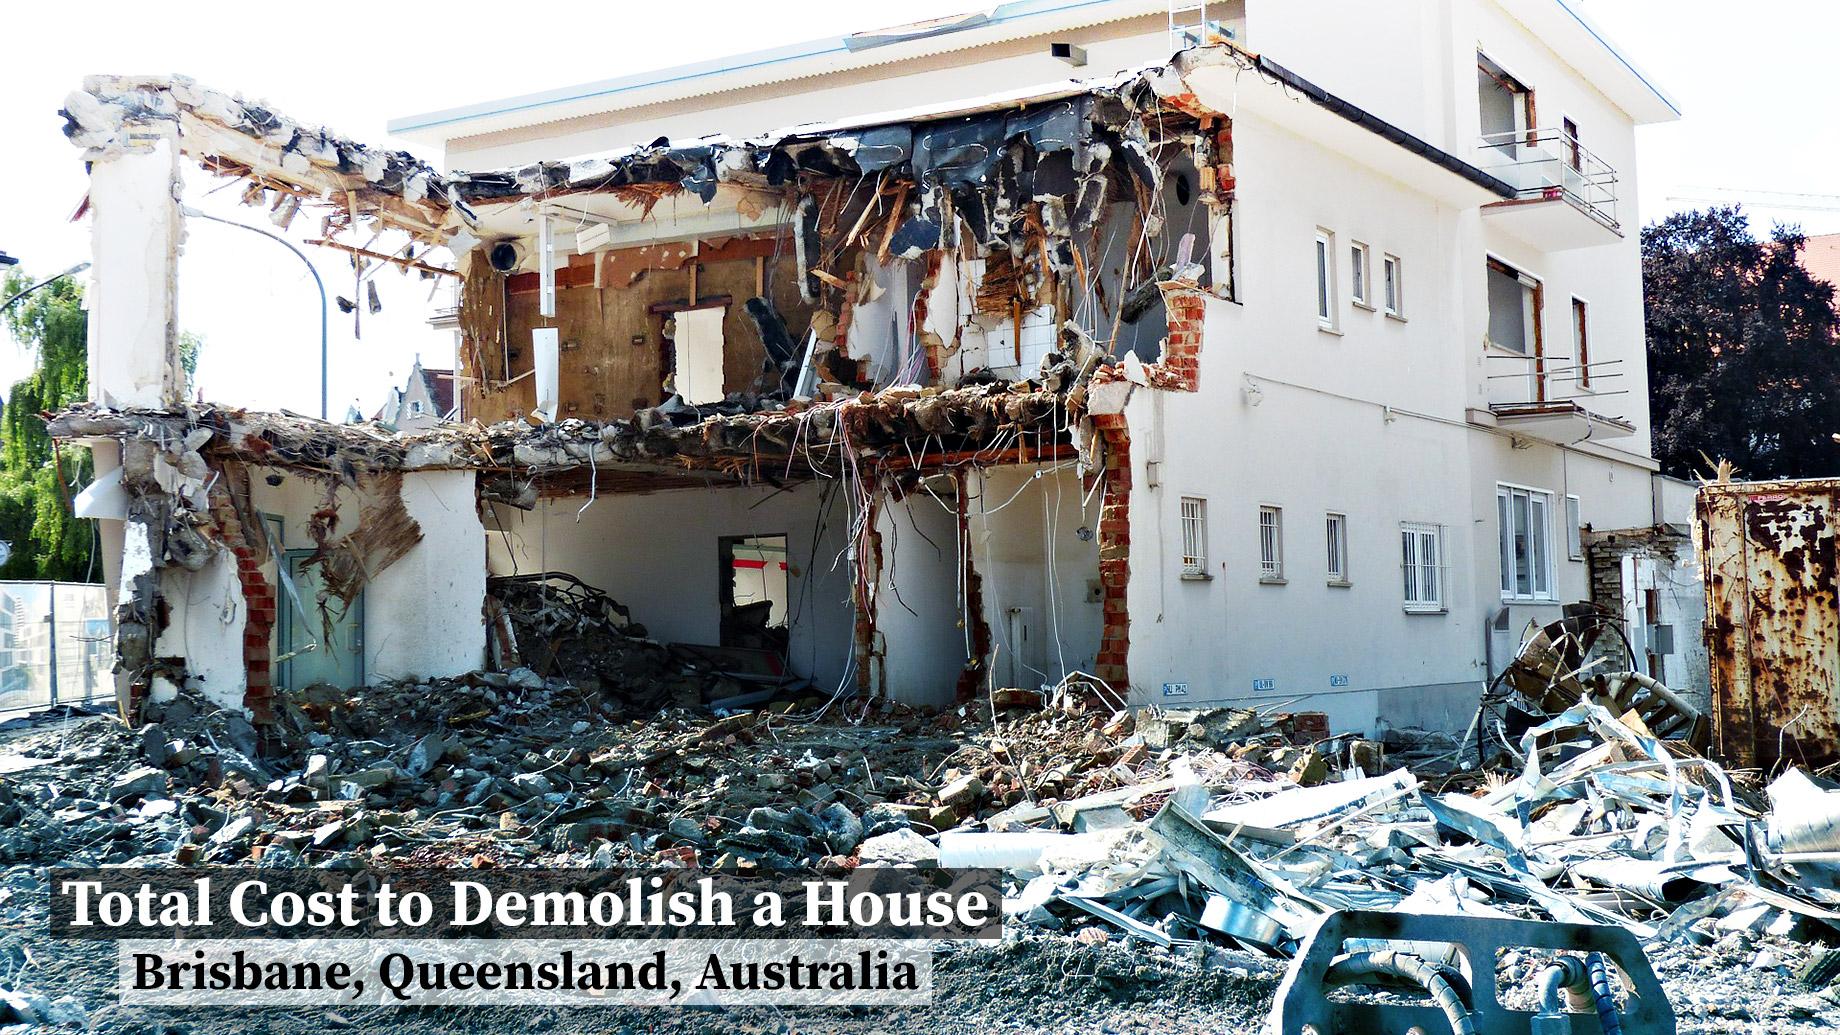 Total Cost to Demolish a House in Brisbane, Queensland, Australia